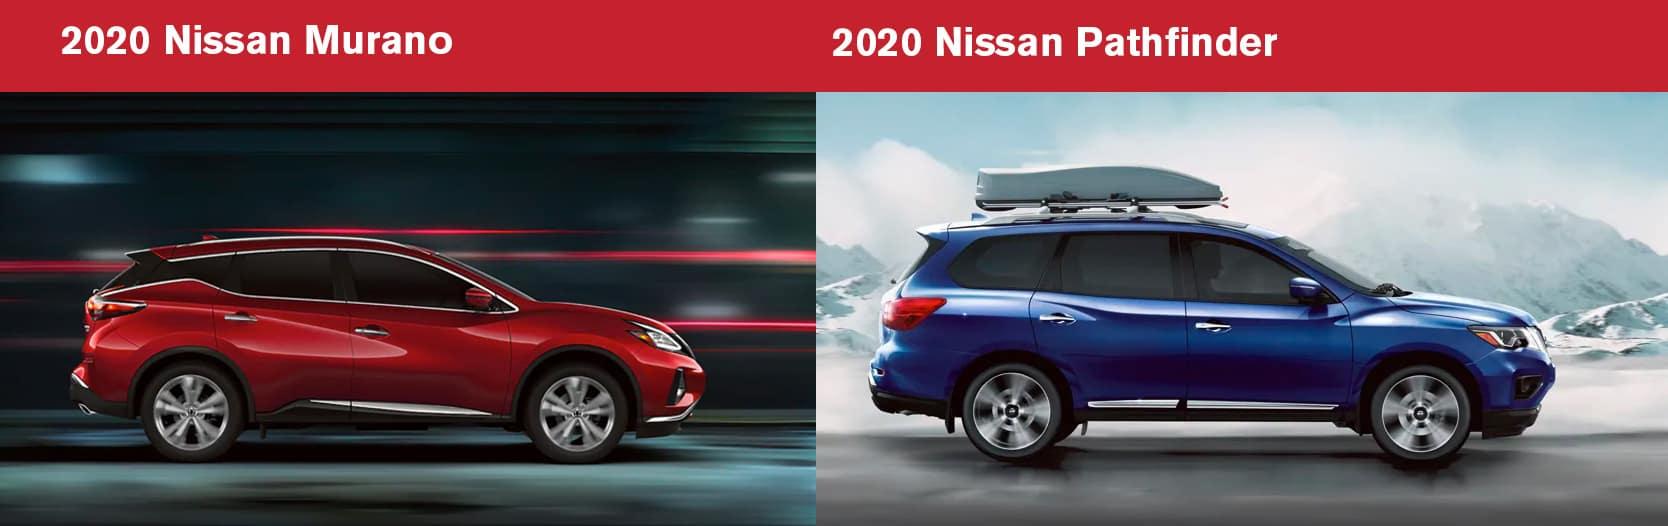 2020 Nissan Murano vs 2020 Nissan Pathfinder